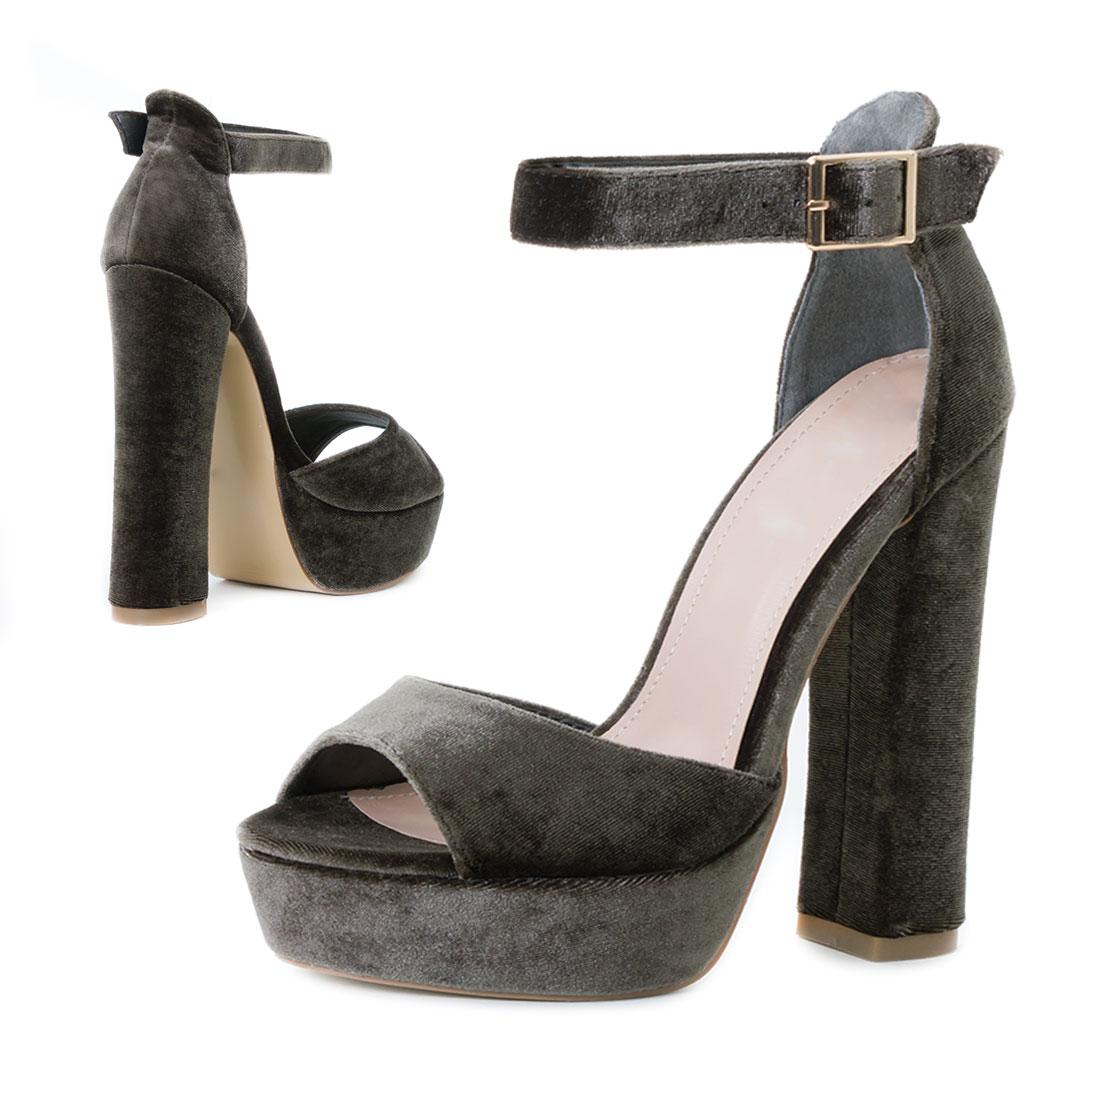 neu damen plateau sandalen sandaletten pumps schuhe gr e 35 36 37 38 39 40 ebay. Black Bedroom Furniture Sets. Home Design Ideas